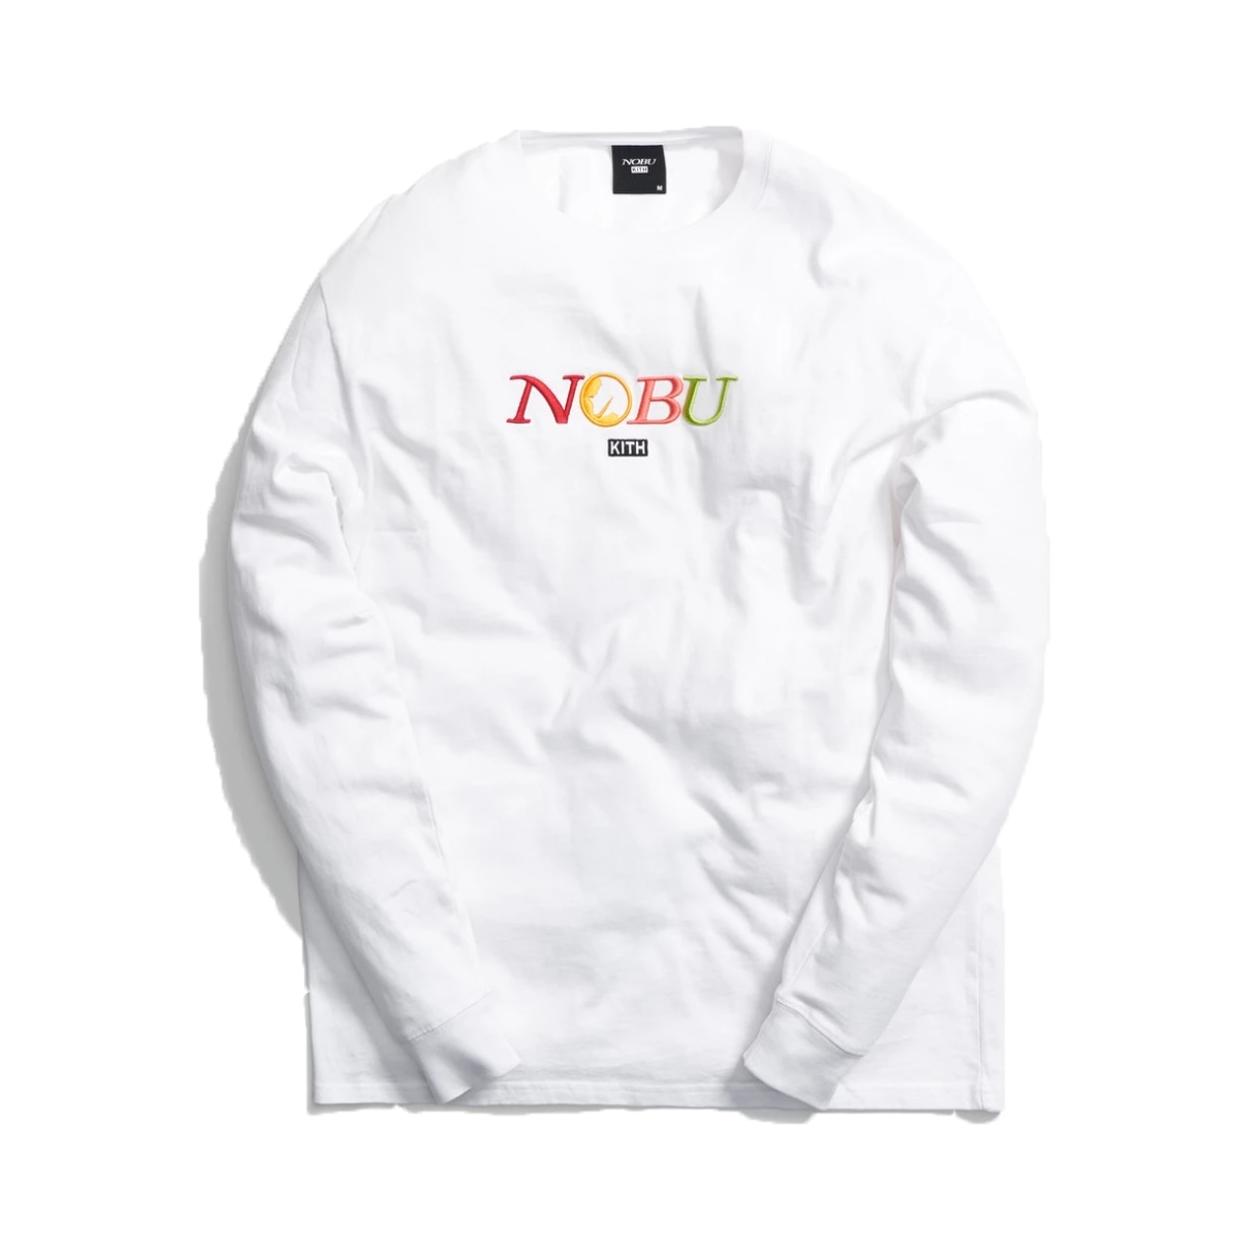 Kith x Nobu Multi Logo L/S Tee 联名长袖T恤